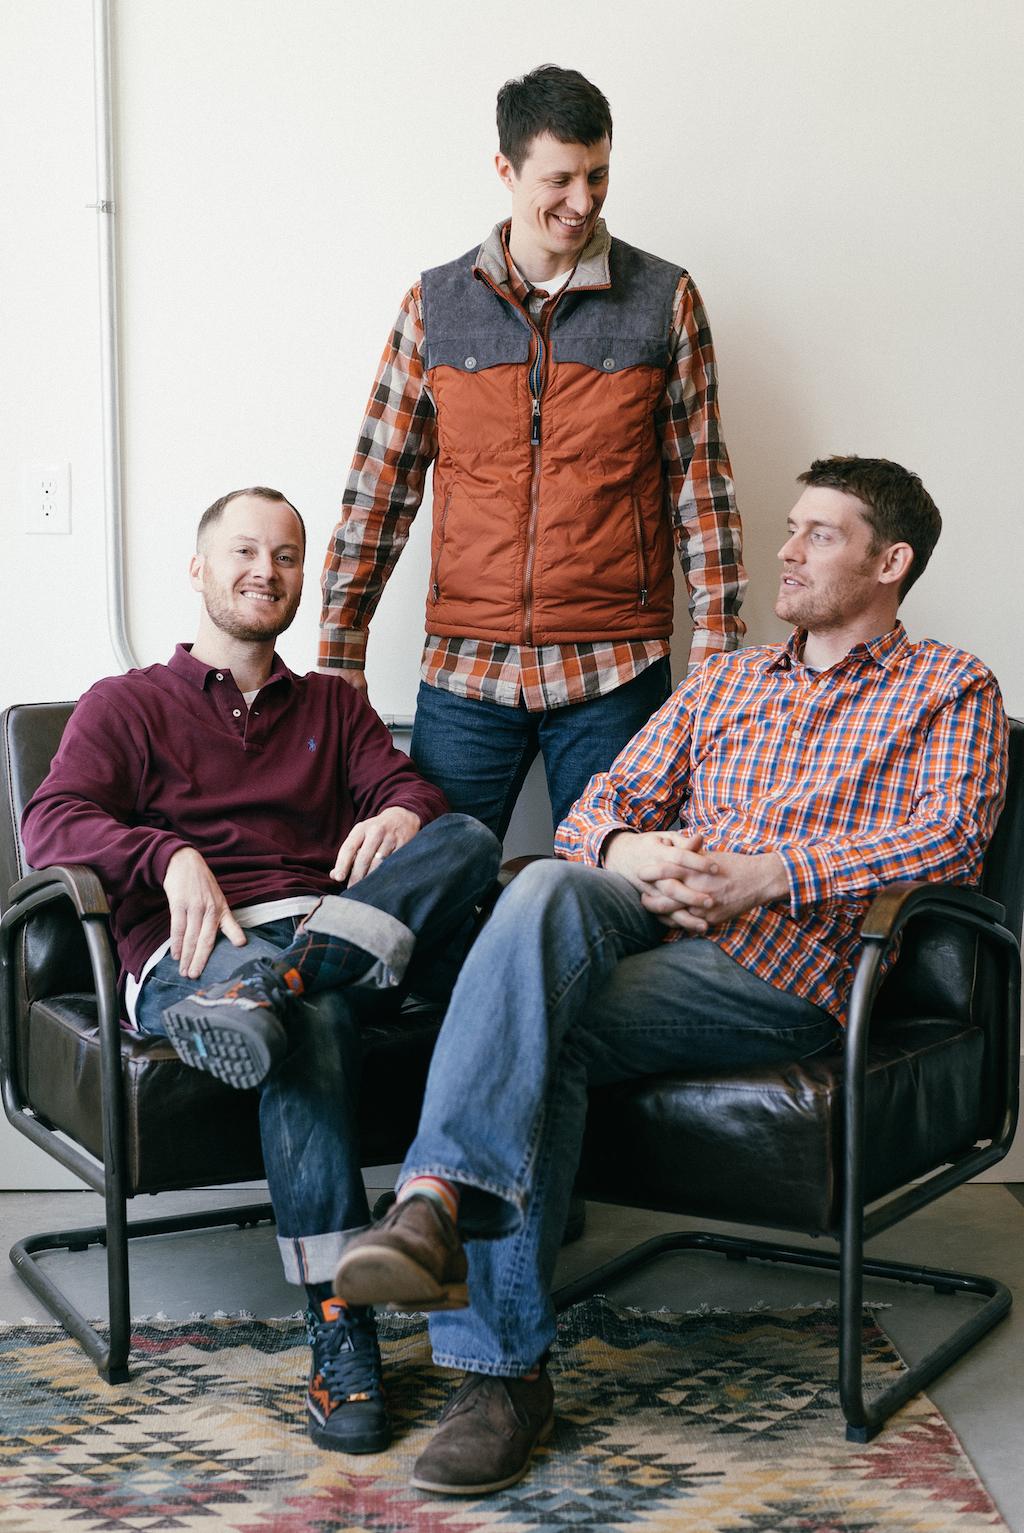 Brad Anthony, Matt Argo and Zach Hensley of Good Folks Coffee. All photos courtesy of Good Folks.